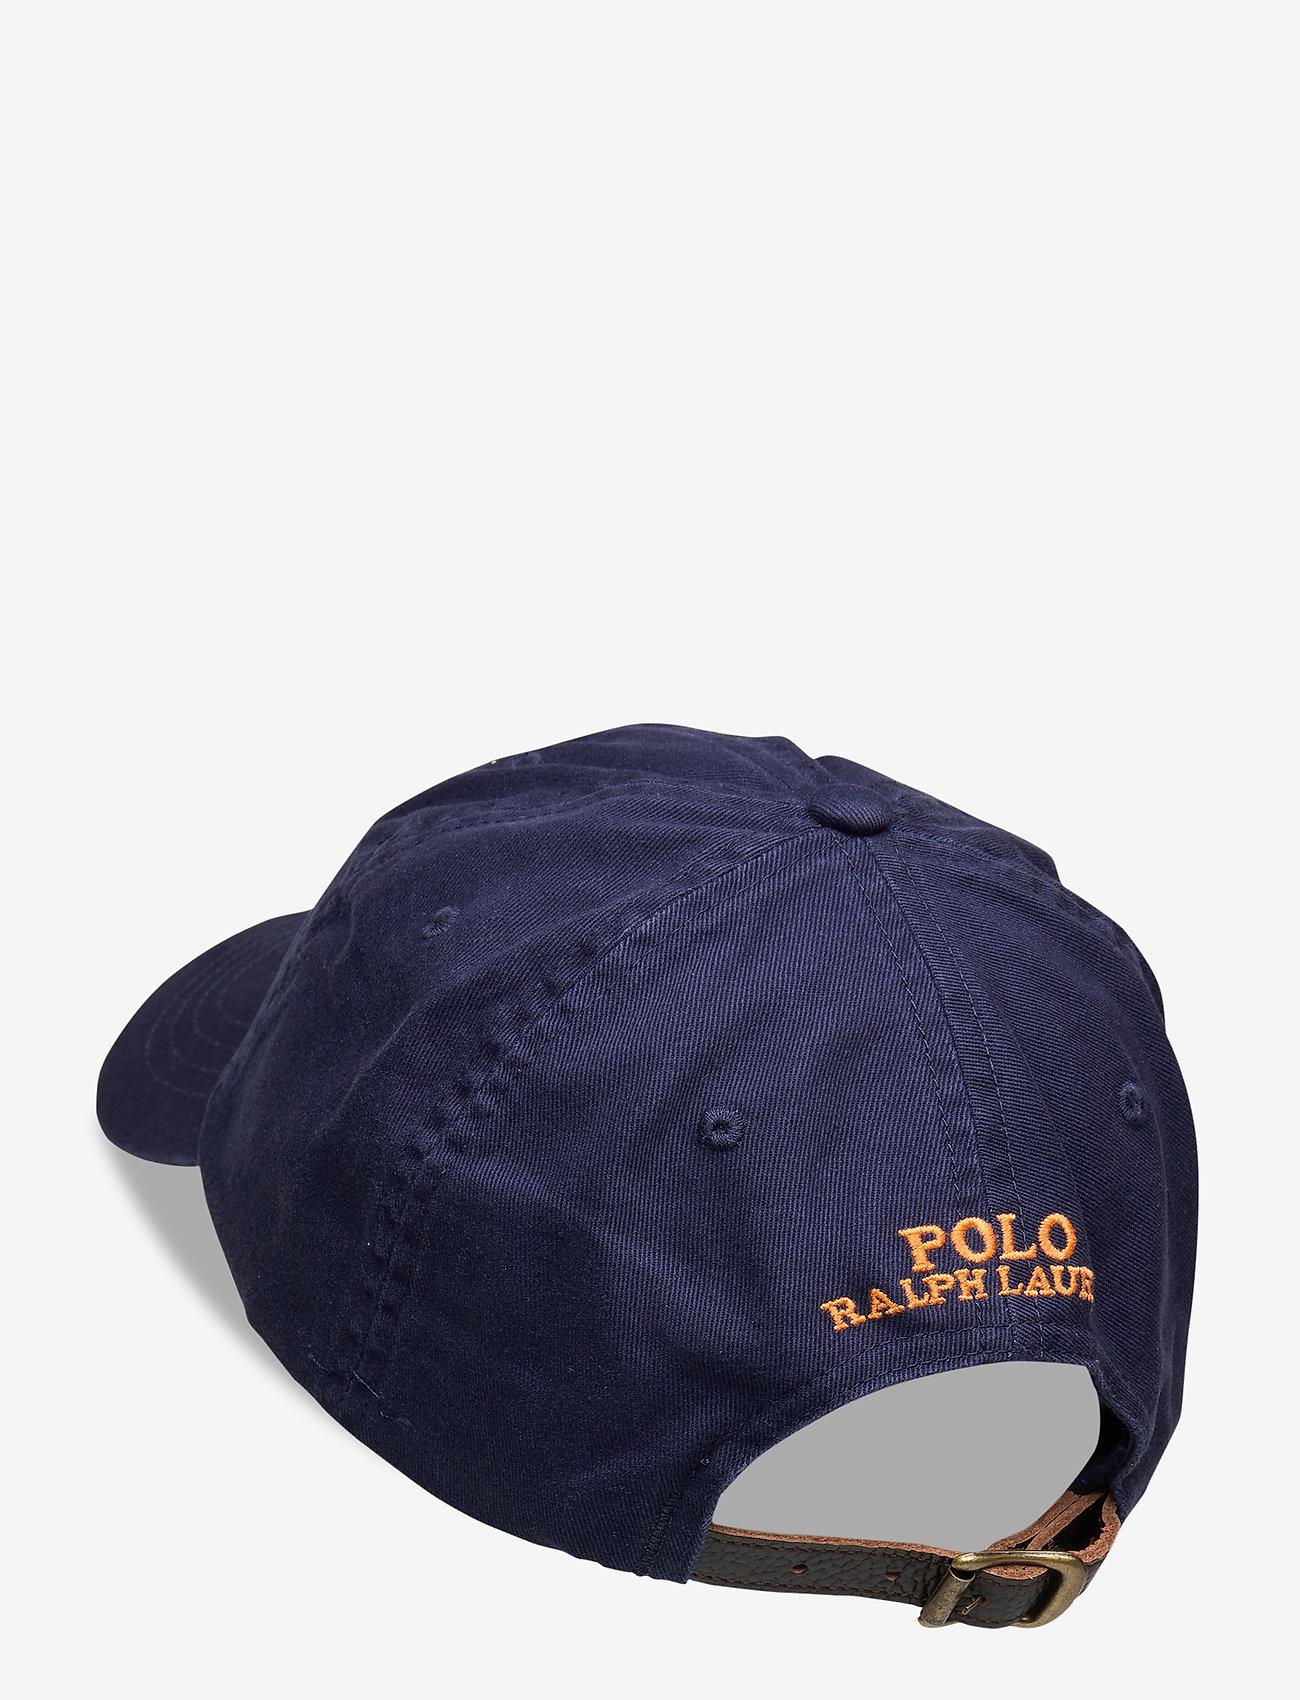 Polo Ralph Lauren - NEW BOND CHINO-CLASSIC SPORT CAP - caps - newport navy - 1